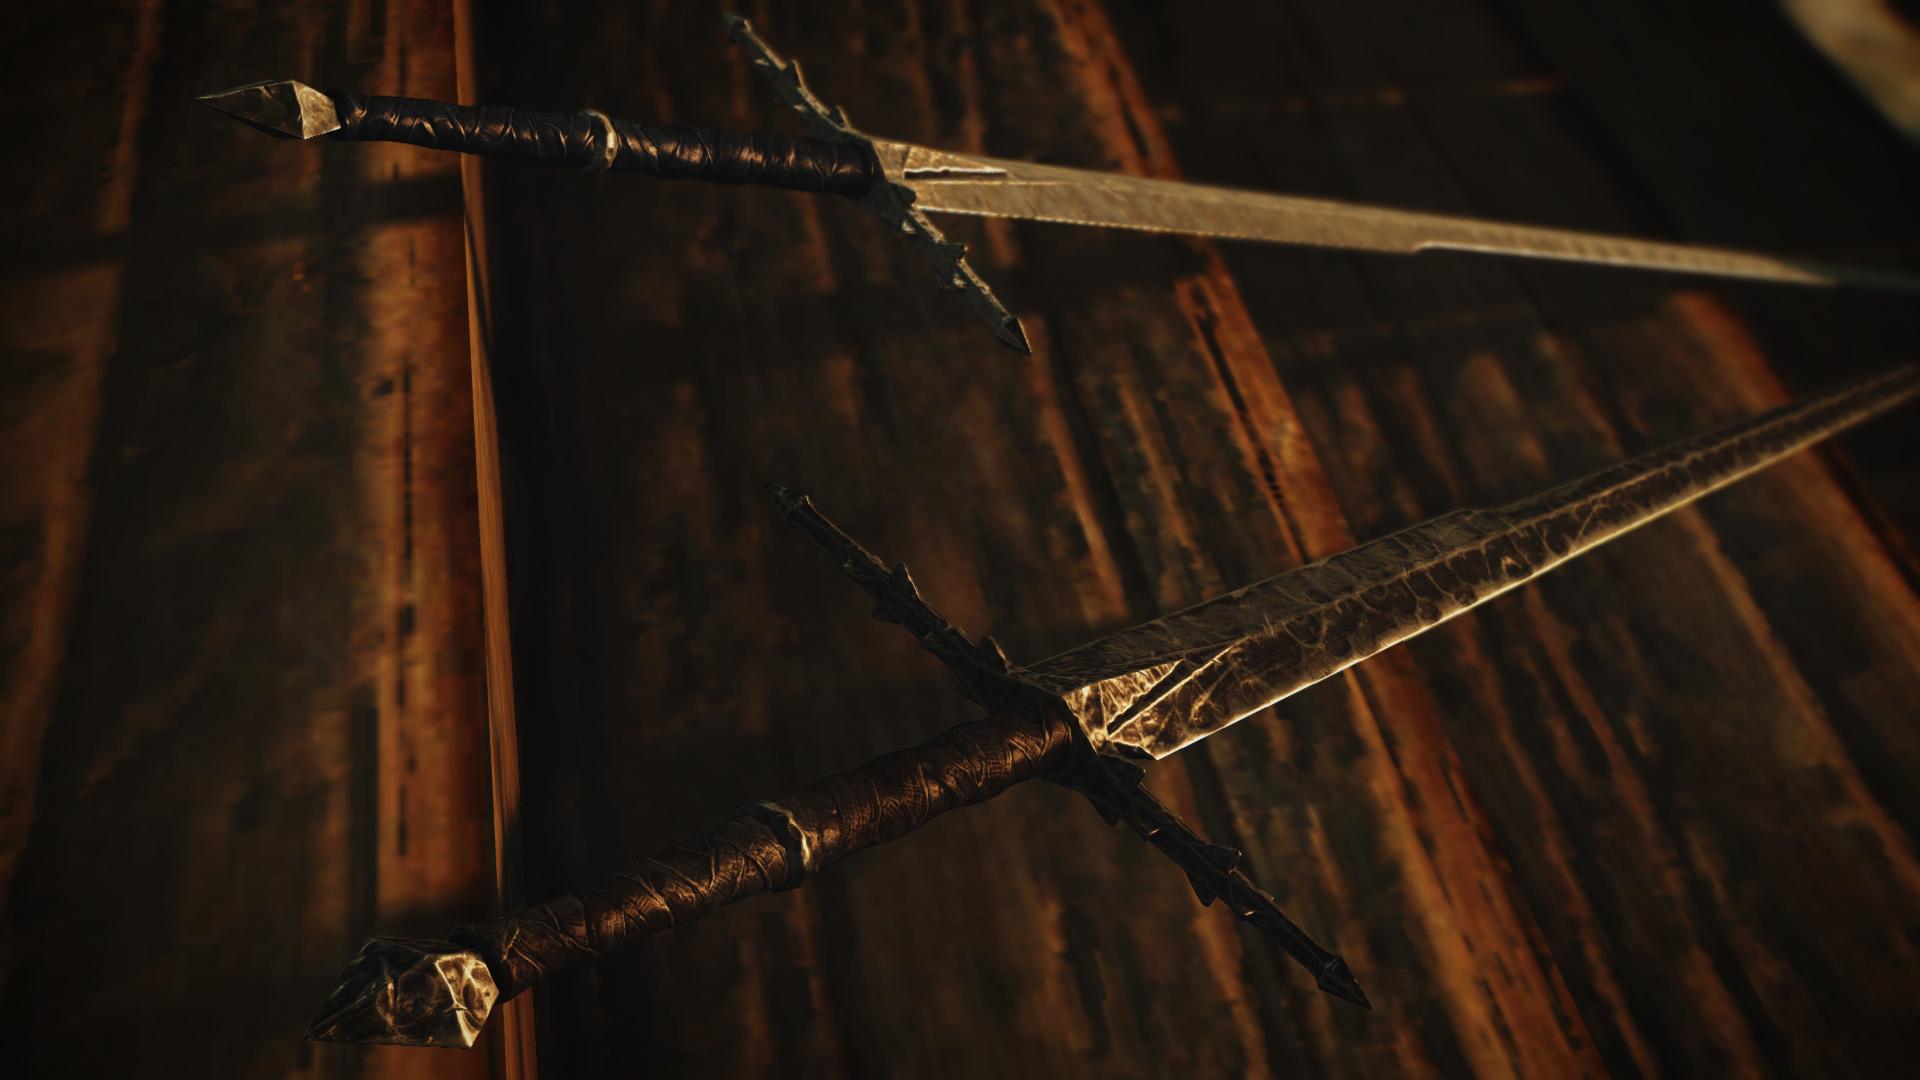 Мод Blade Dancer Скайрим - картинка 1